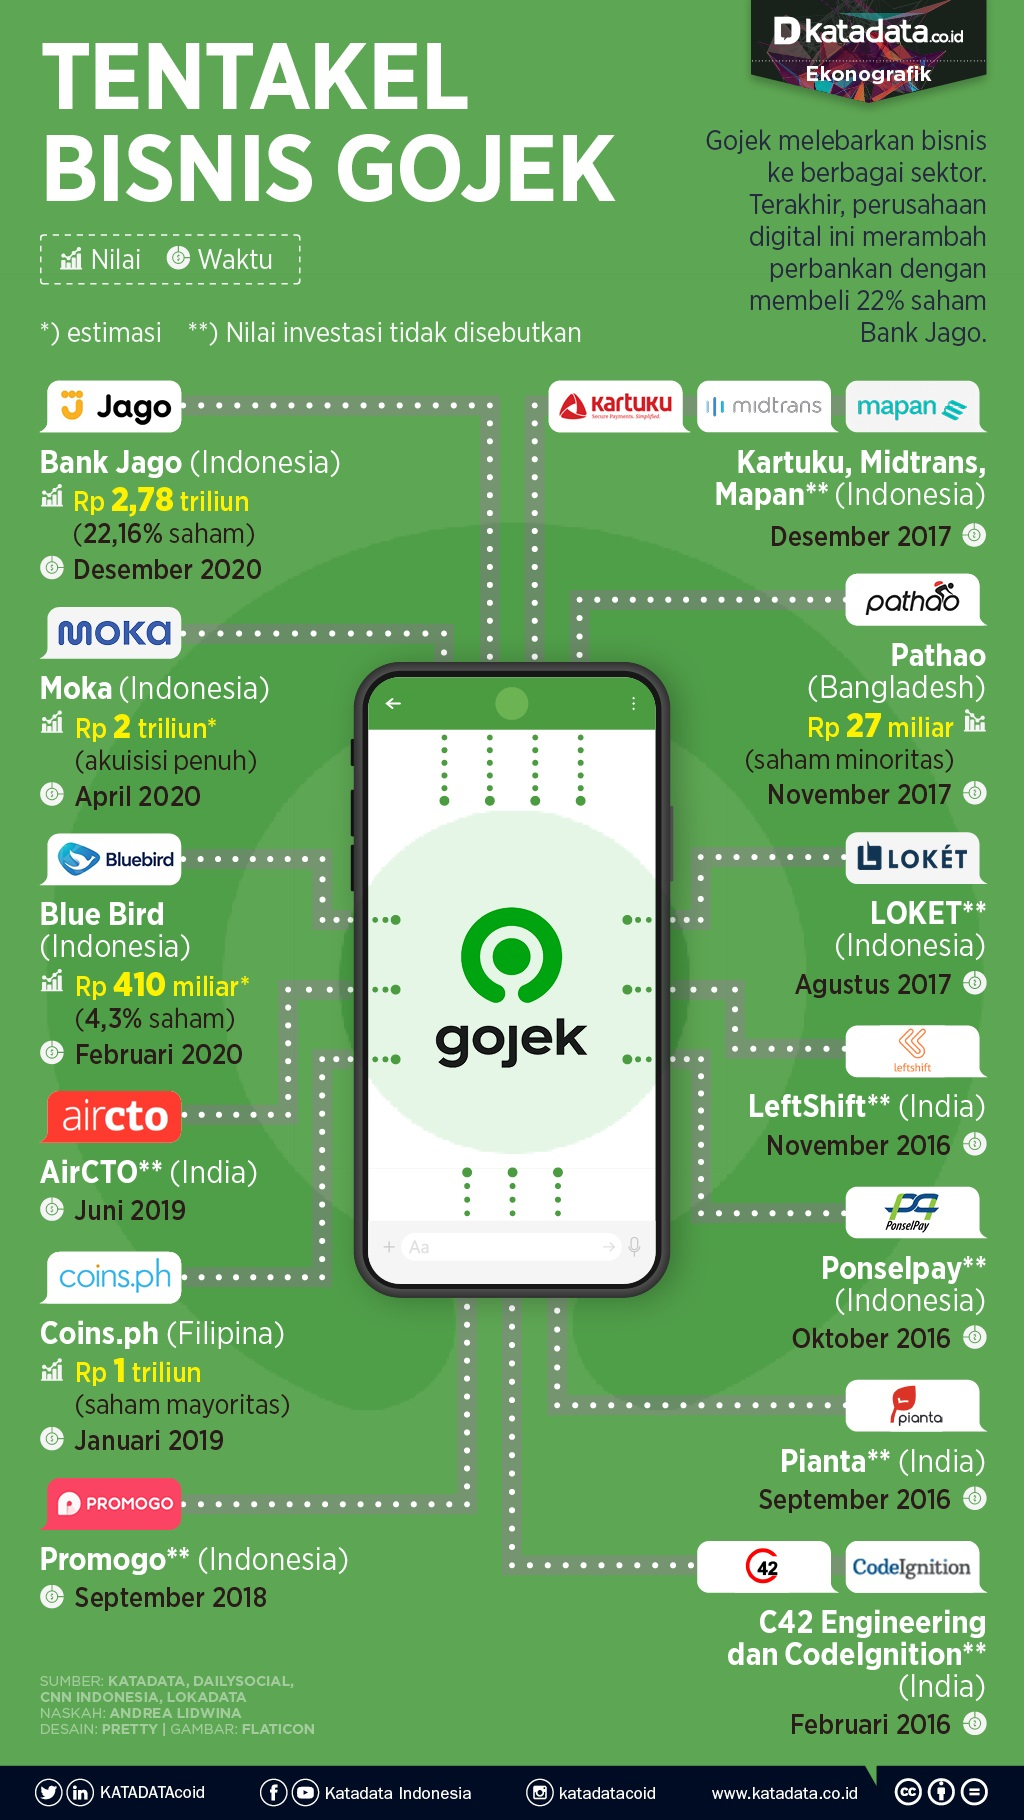 Infografik_Tentakel bisnis gojek